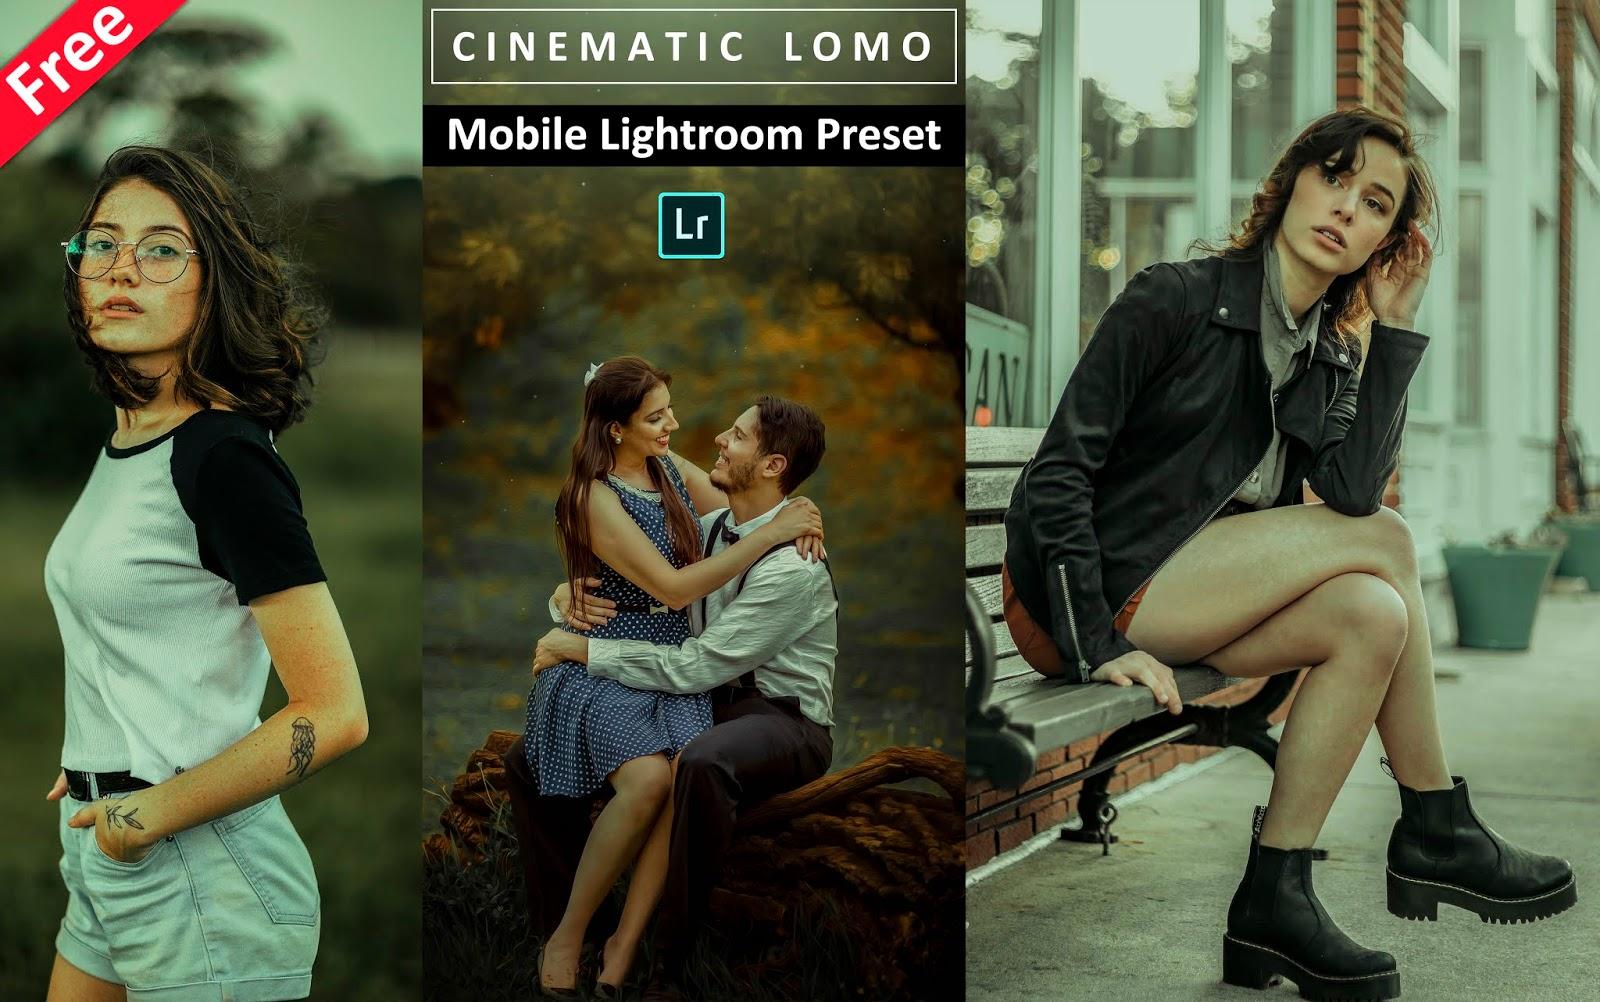 Download Cinematic LOMO Mobile Lightroom Preset for Free | How to Create LOMO Effect in Lightroom